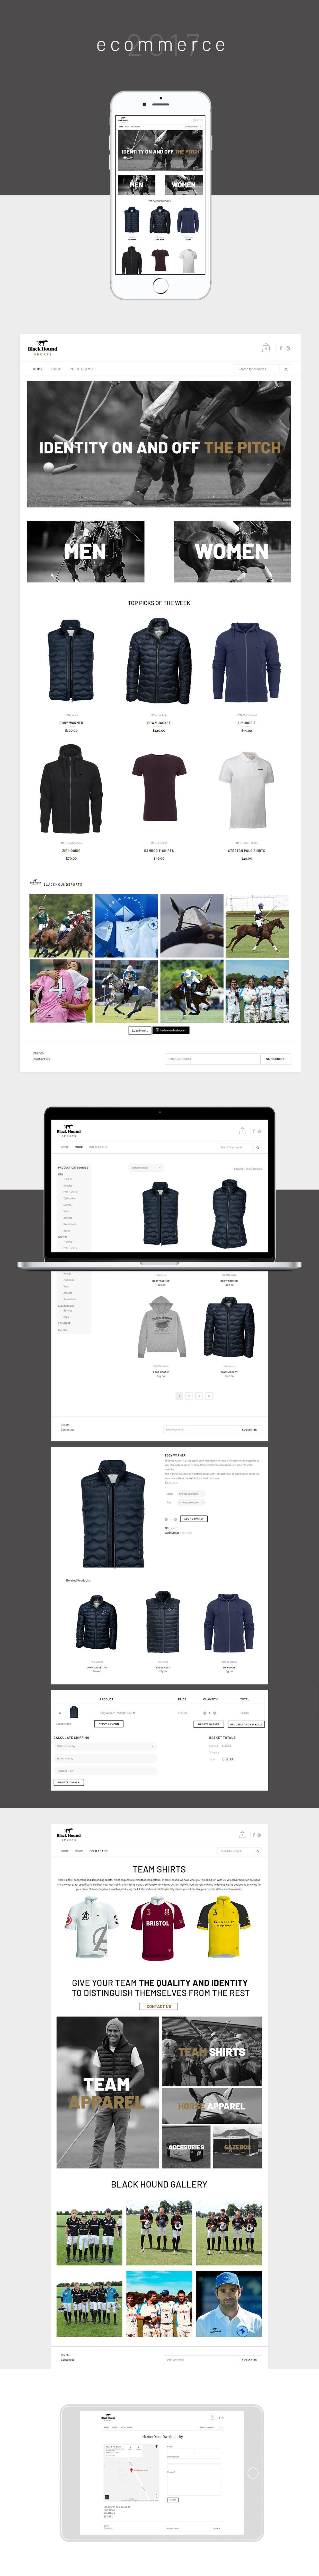 Ecommerce,Web,sitio web,Web Design ,graphic design ,diseño gráfico,web site